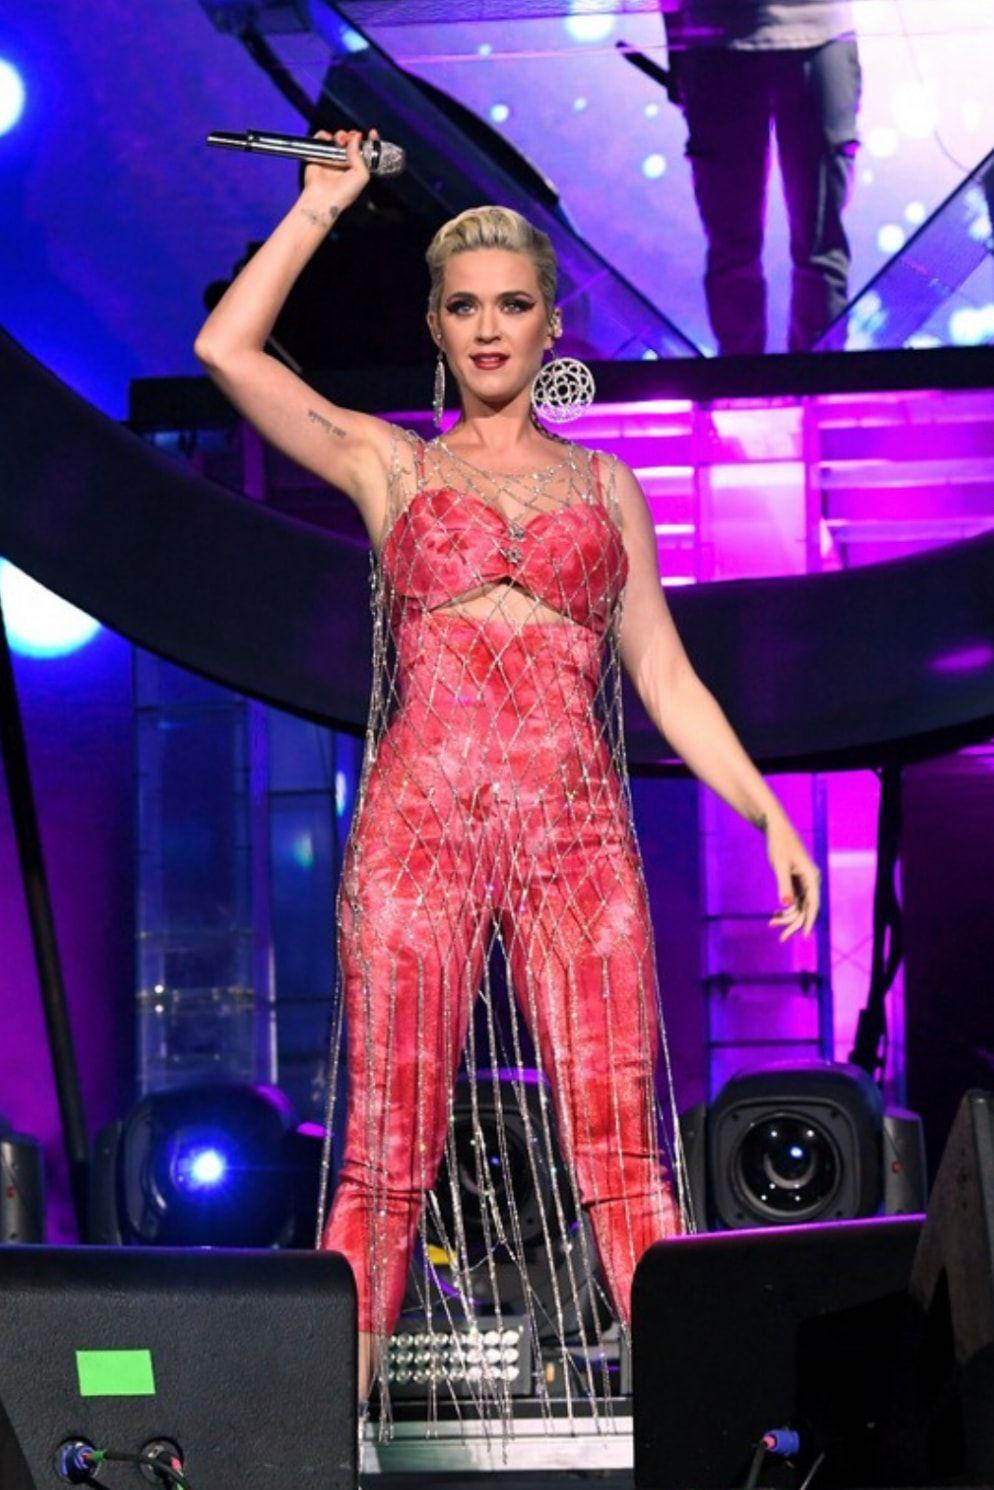 Katy Perry Coachella 2019 Katy perry, Katty perry, Katy